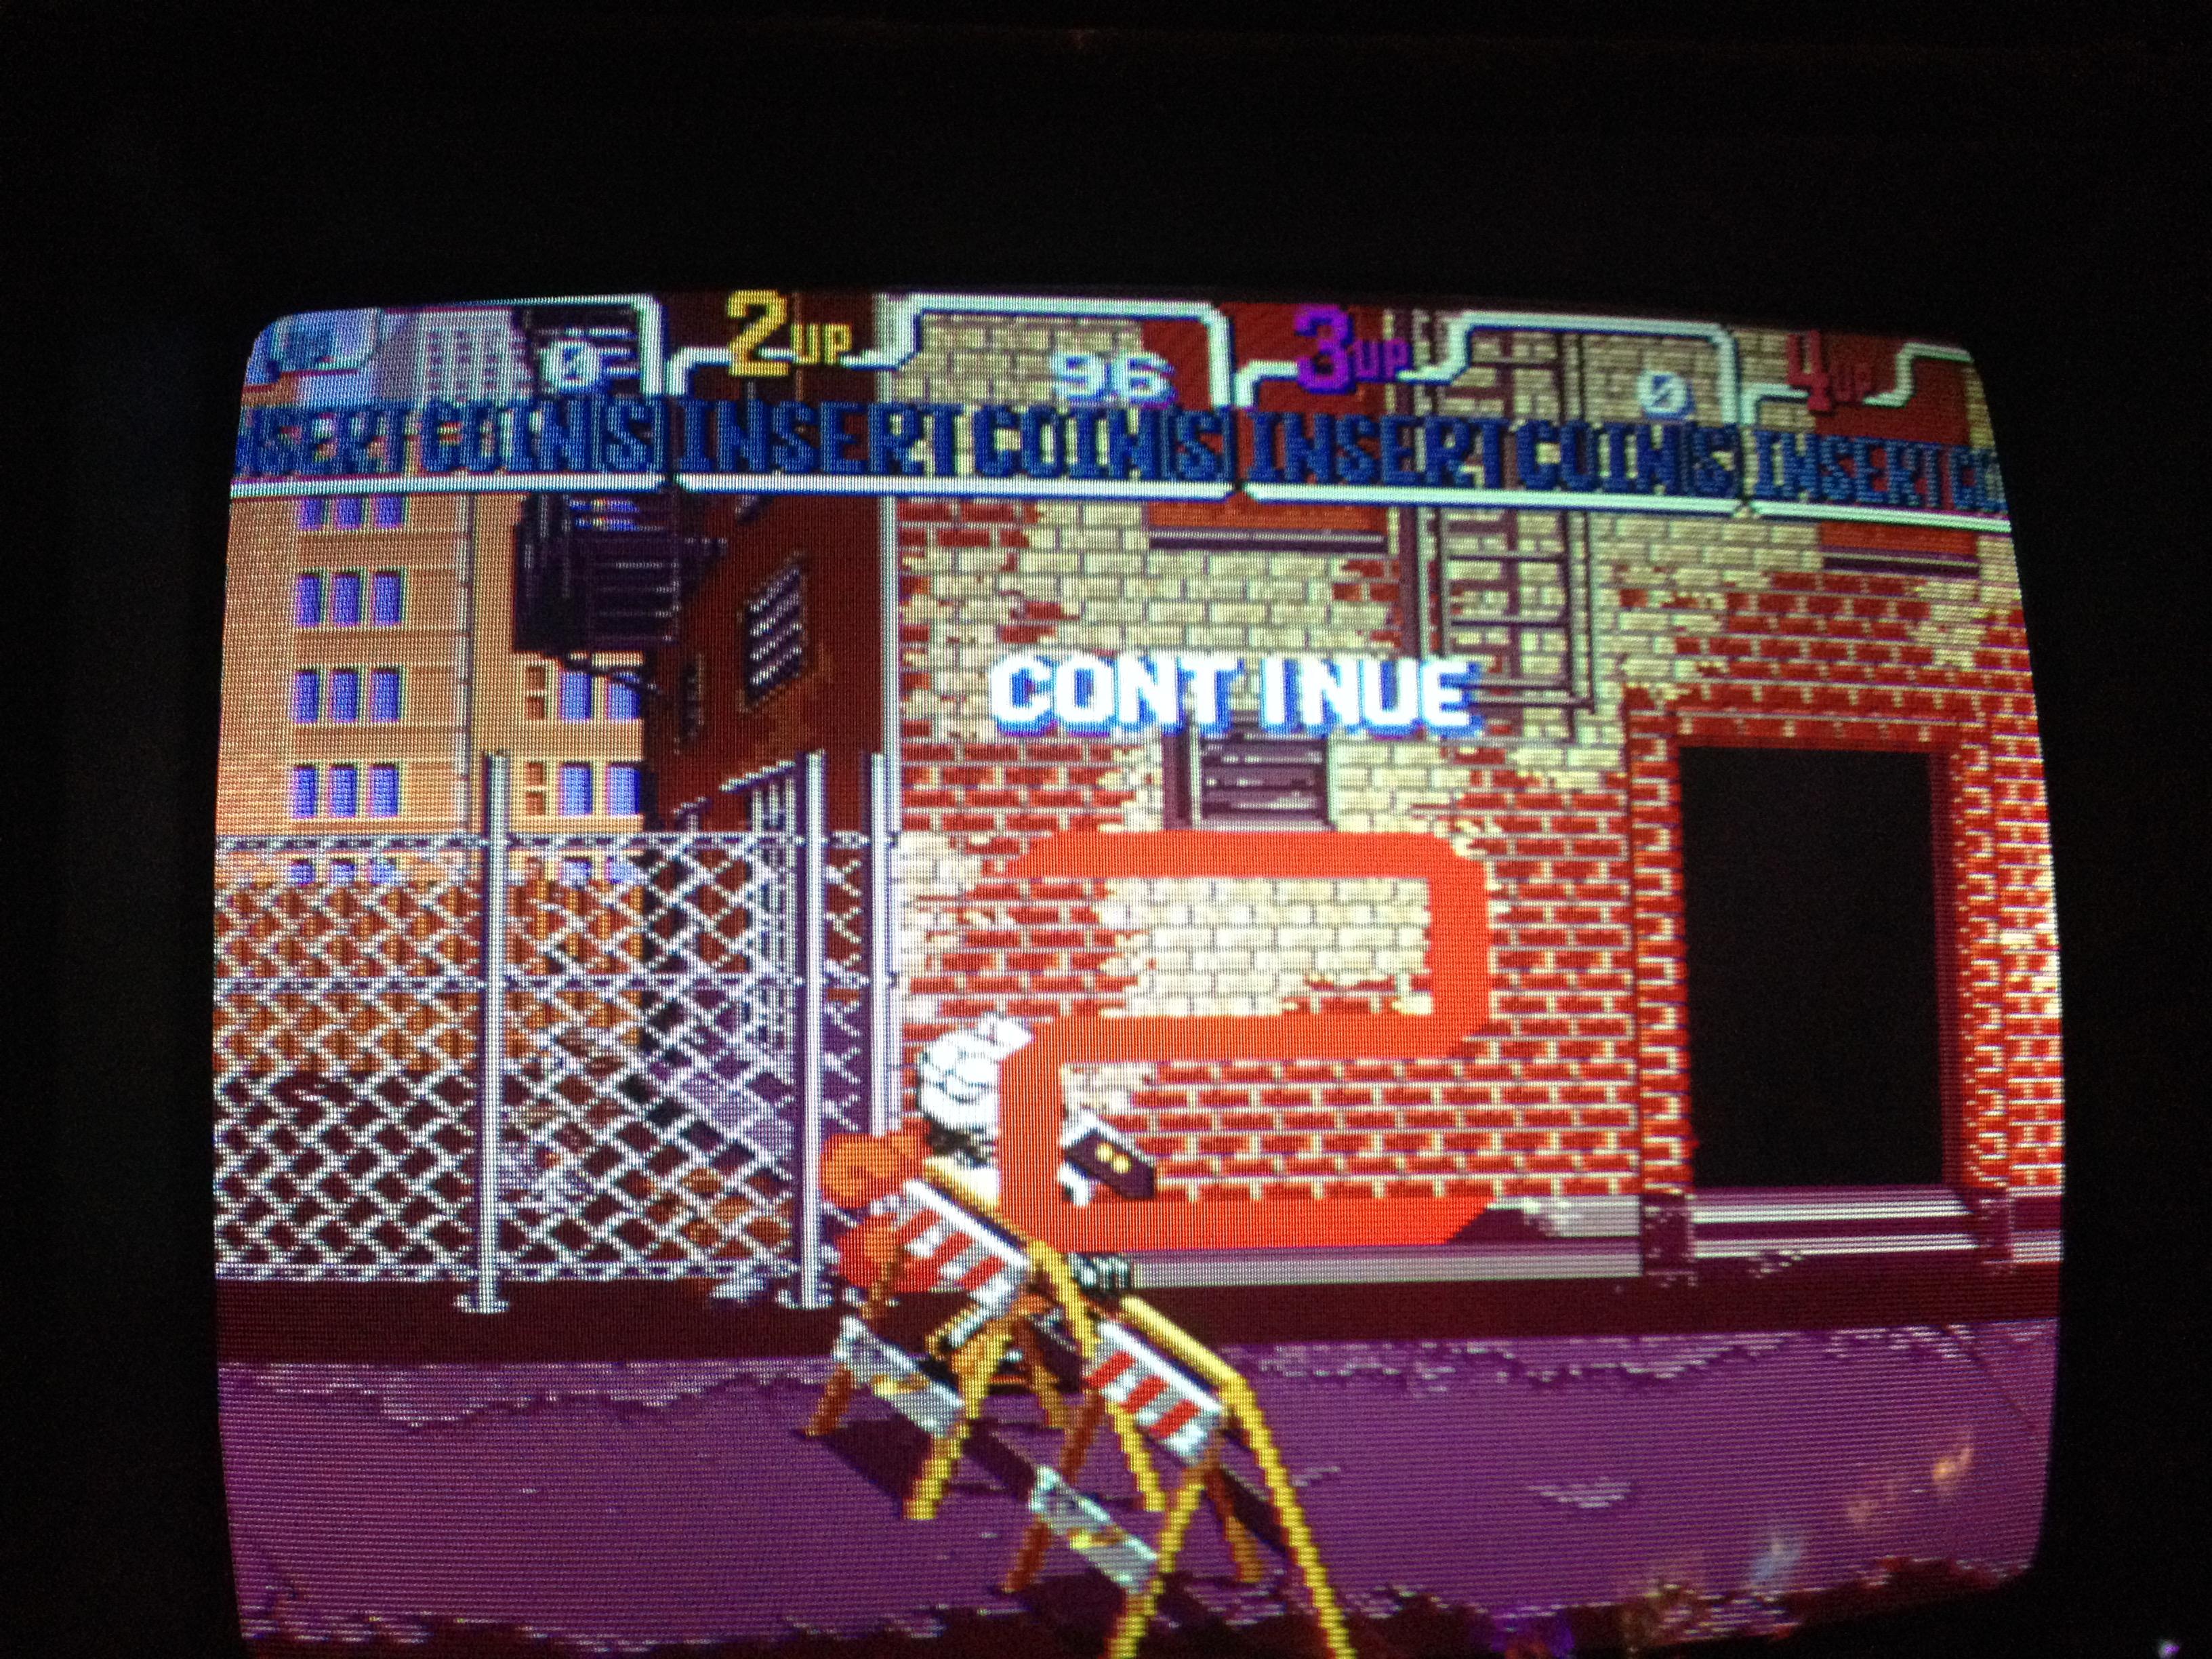 FosterAMF: Teenage Mutant Ninja Turtles: Turtles In Time (Arcade) 96 points on 2014-11-01 14:34:46